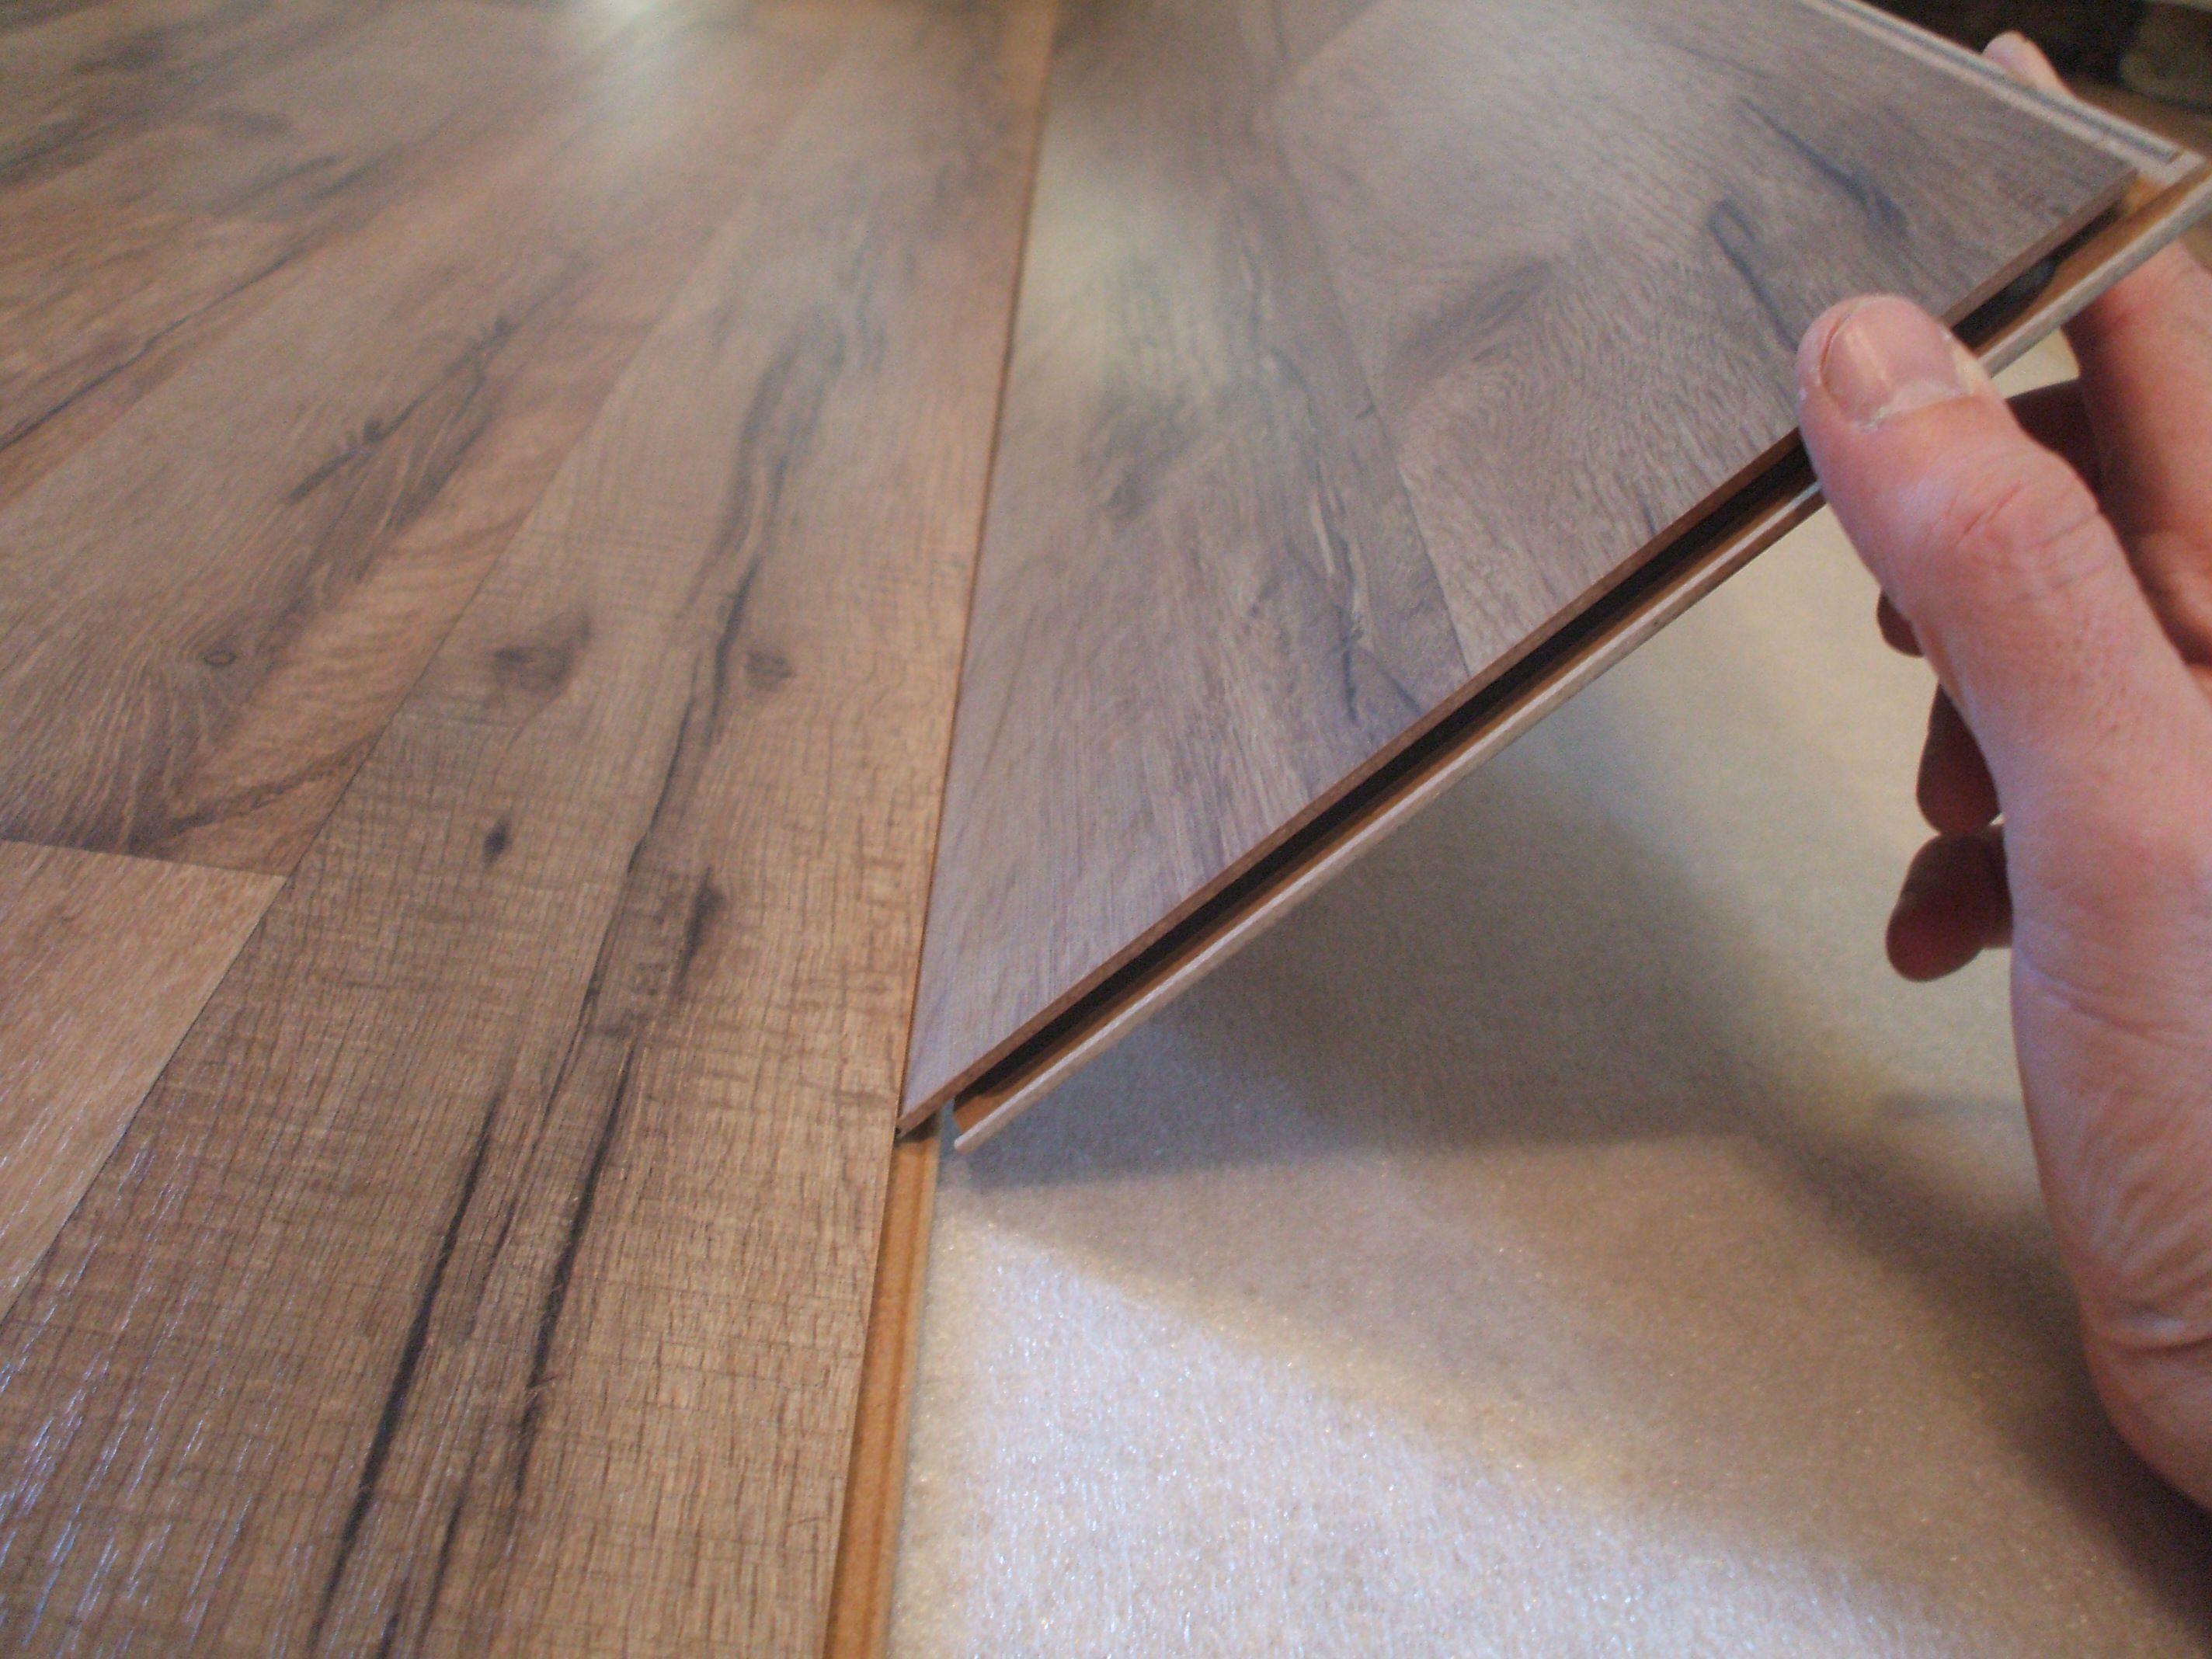 9 16 hardwood flooring of laminate flooring installation made easy regarding installing laminate how locking mechanism works 56a49e423df78cf772834b19 jpg